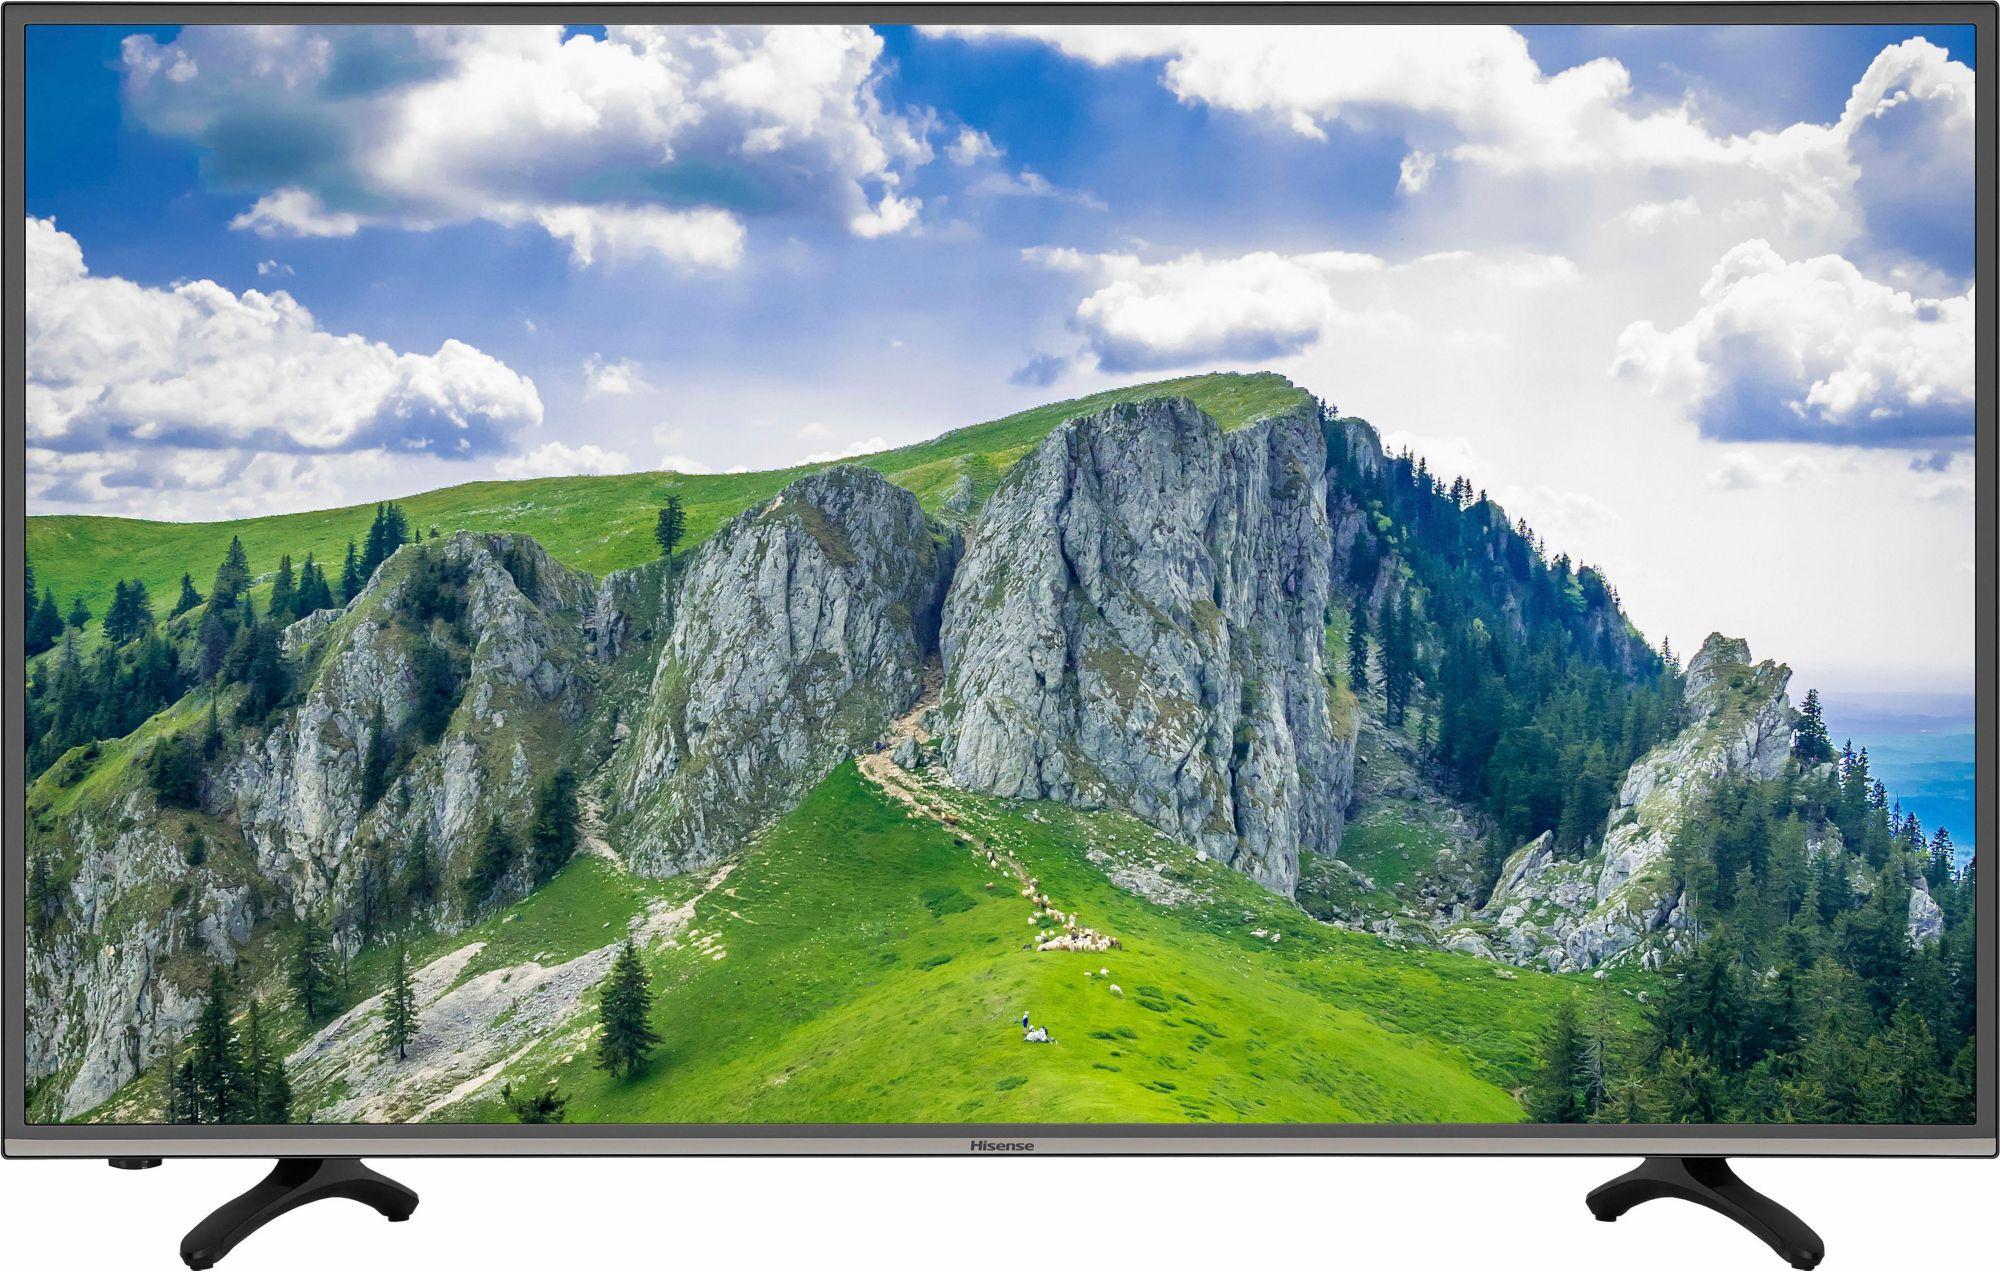 HISENSE Hisense H49MEC3050, LED Fernseher, 123 cm (49 Zoll), 2160p (4K Ultra HD), Smart-TV